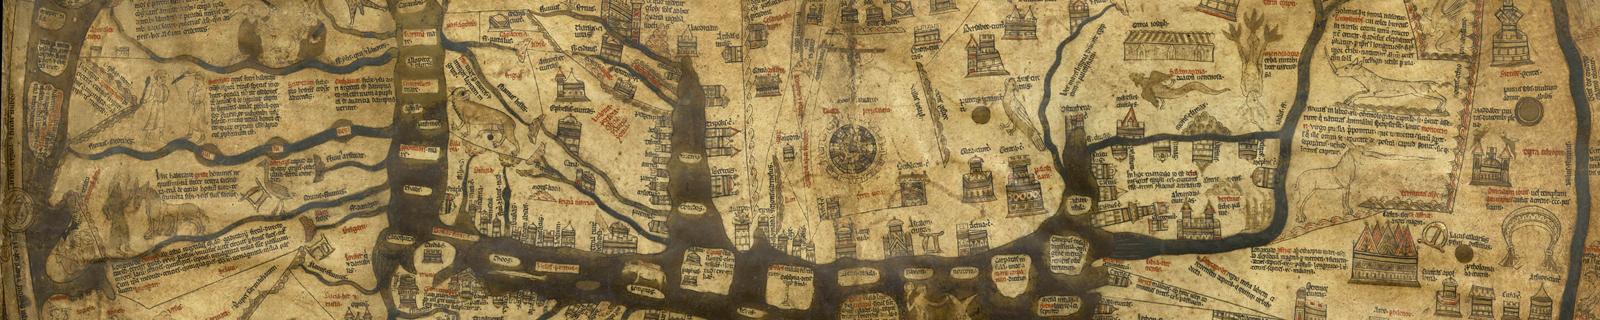 Hereford Mappa Mundi. Public domain image from Wikimedia Commons.